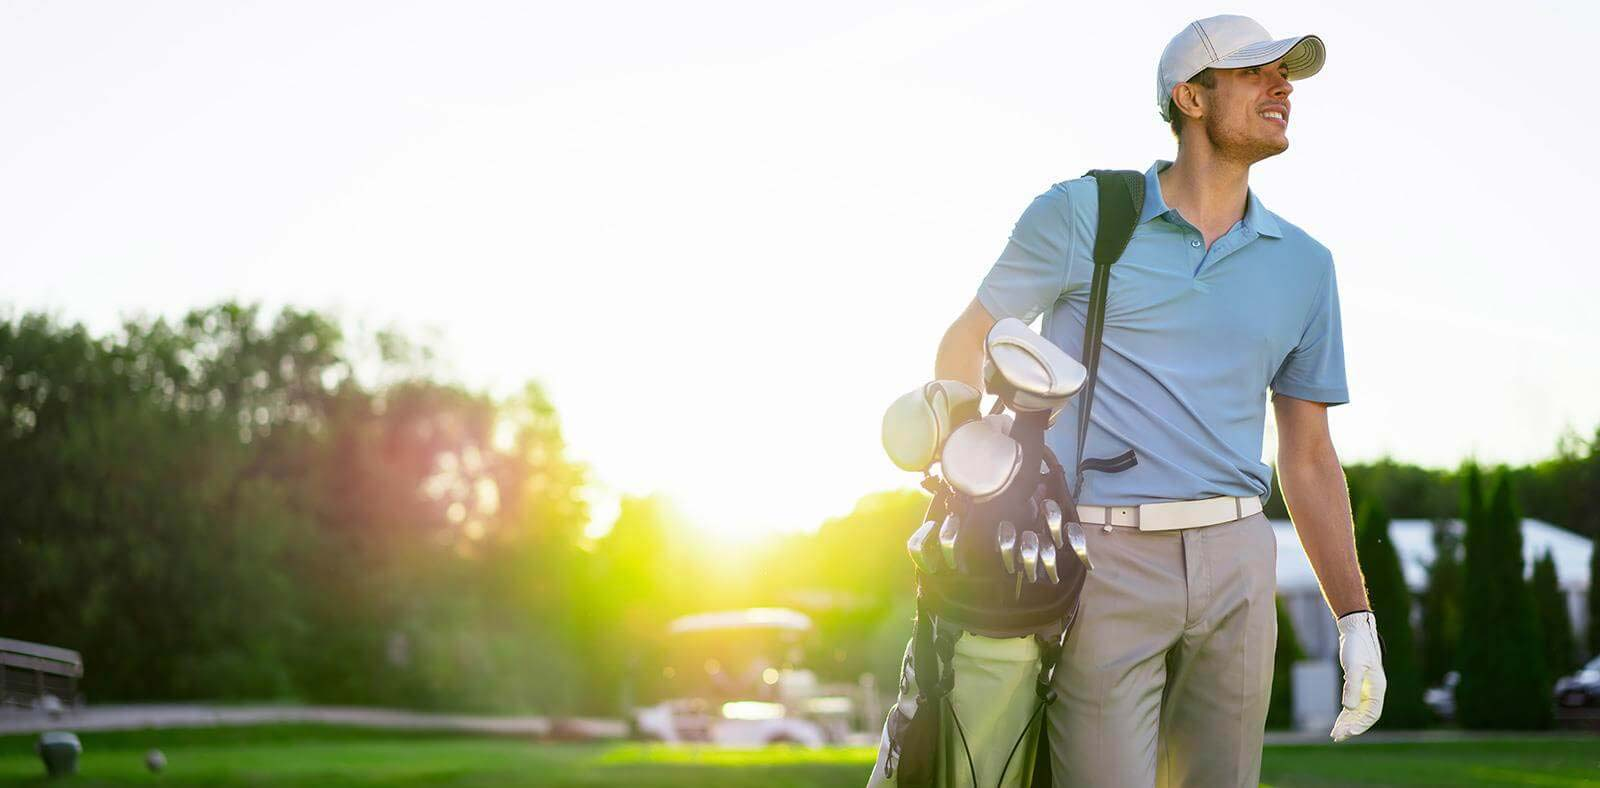 Golfing at Rehoboth Beach